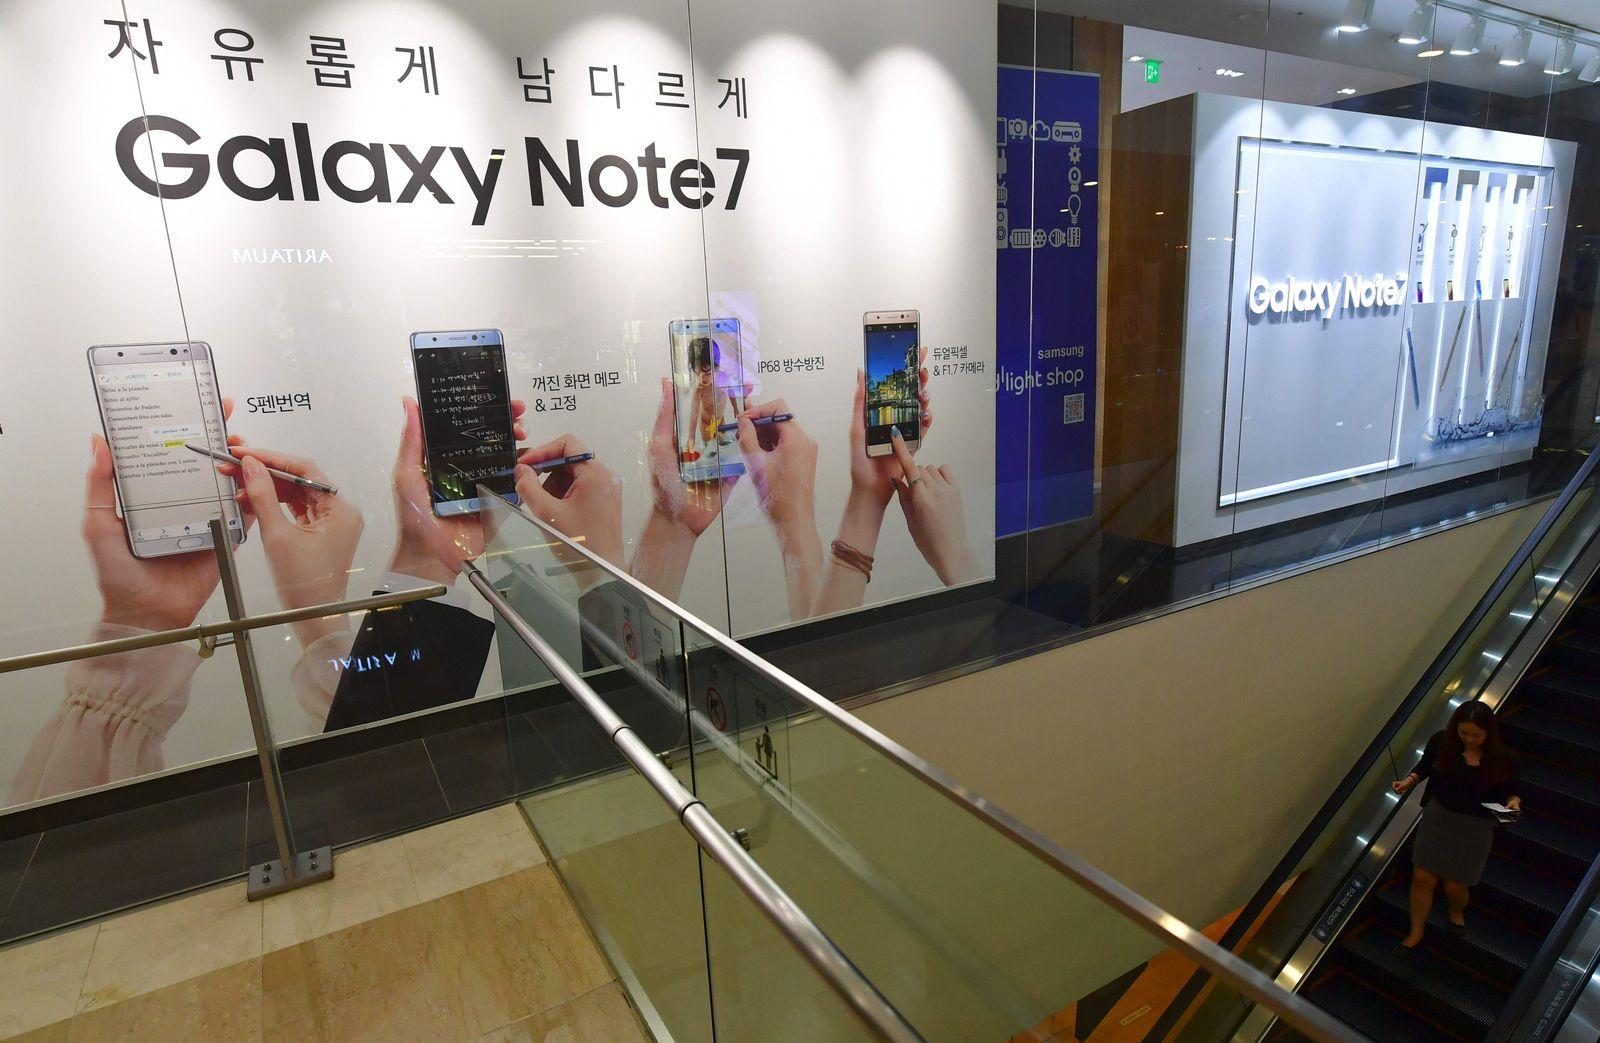 Galaxy Note7 / Samsung